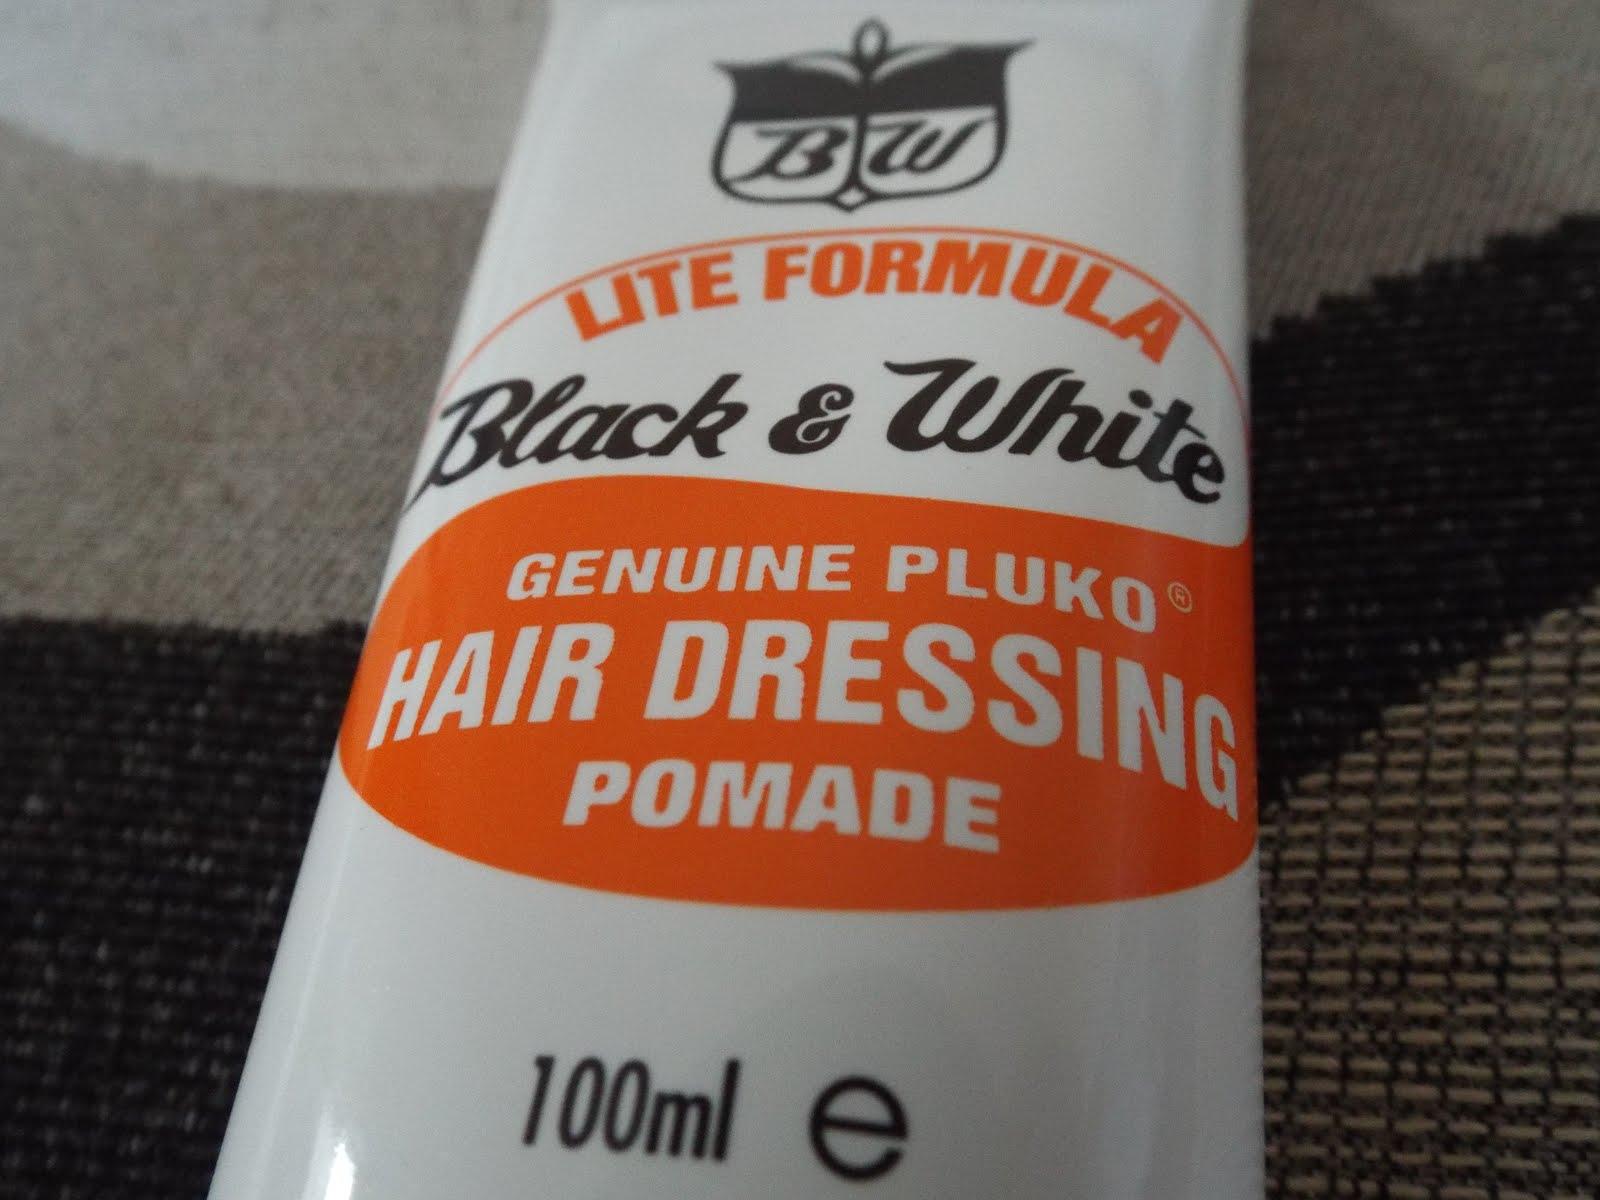 Black and White Genuine Pluko Hair Dressing Pomade